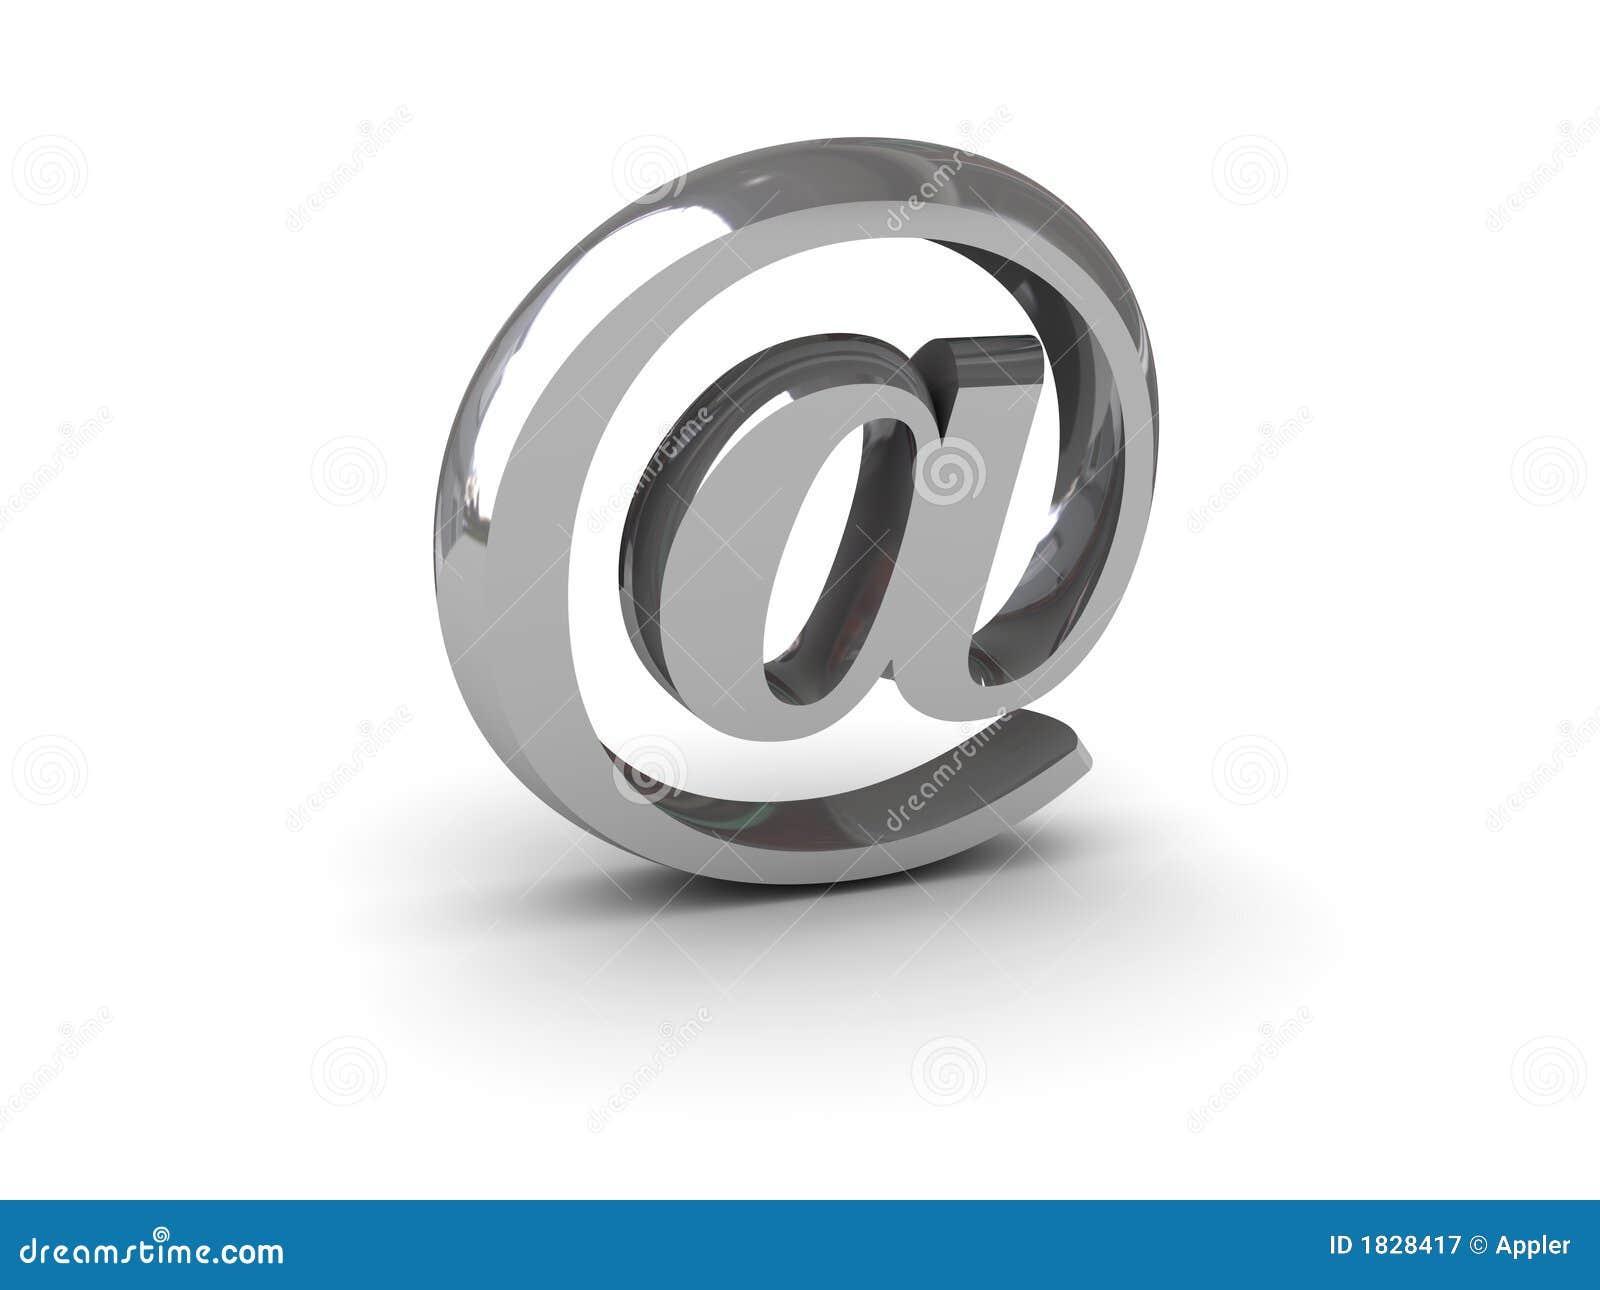 Email aliás